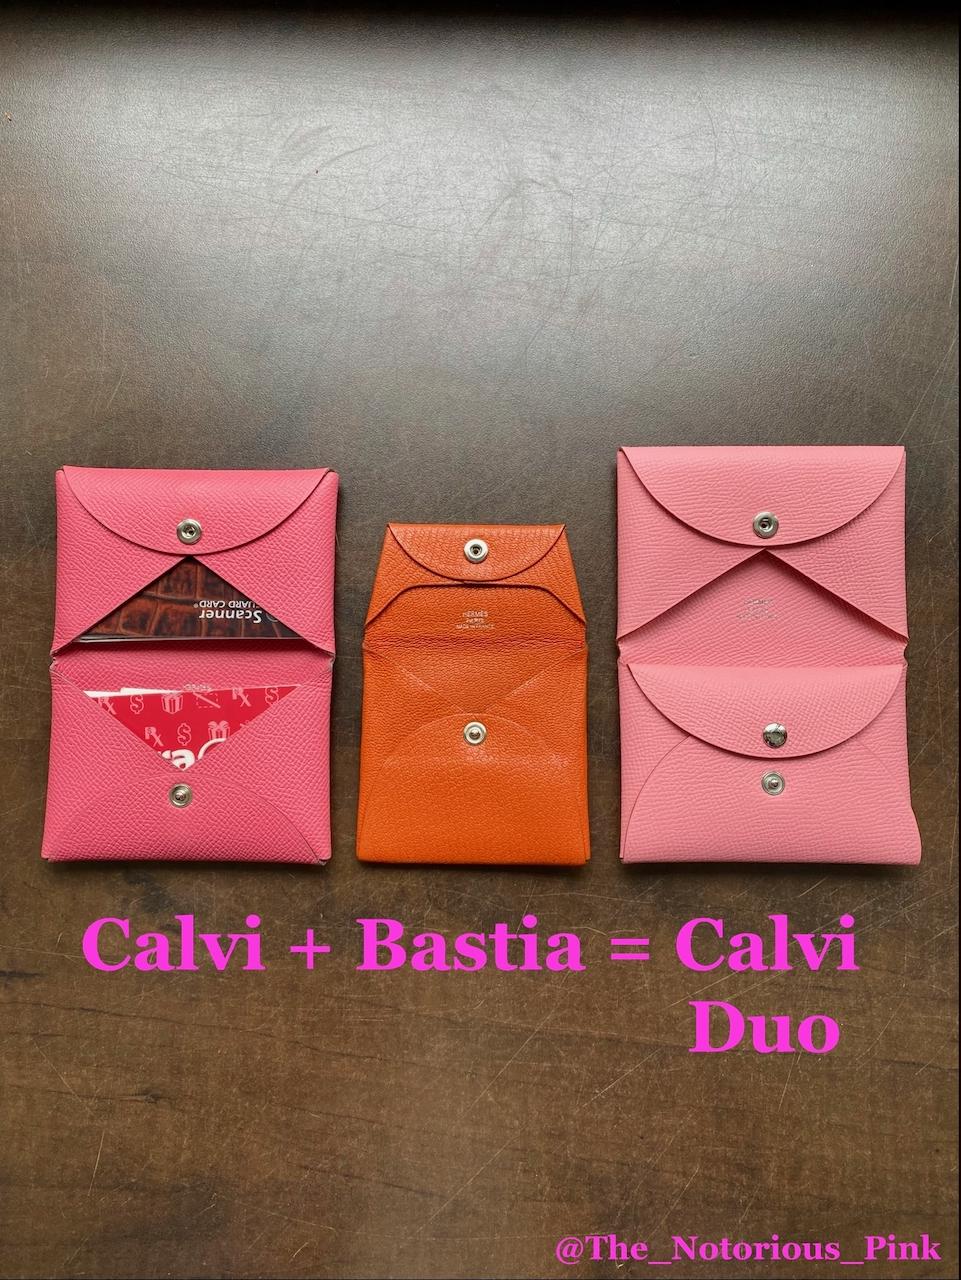 Calvi + Bastia = Calvi Duo. Photo via @The_Notorious_Pink.